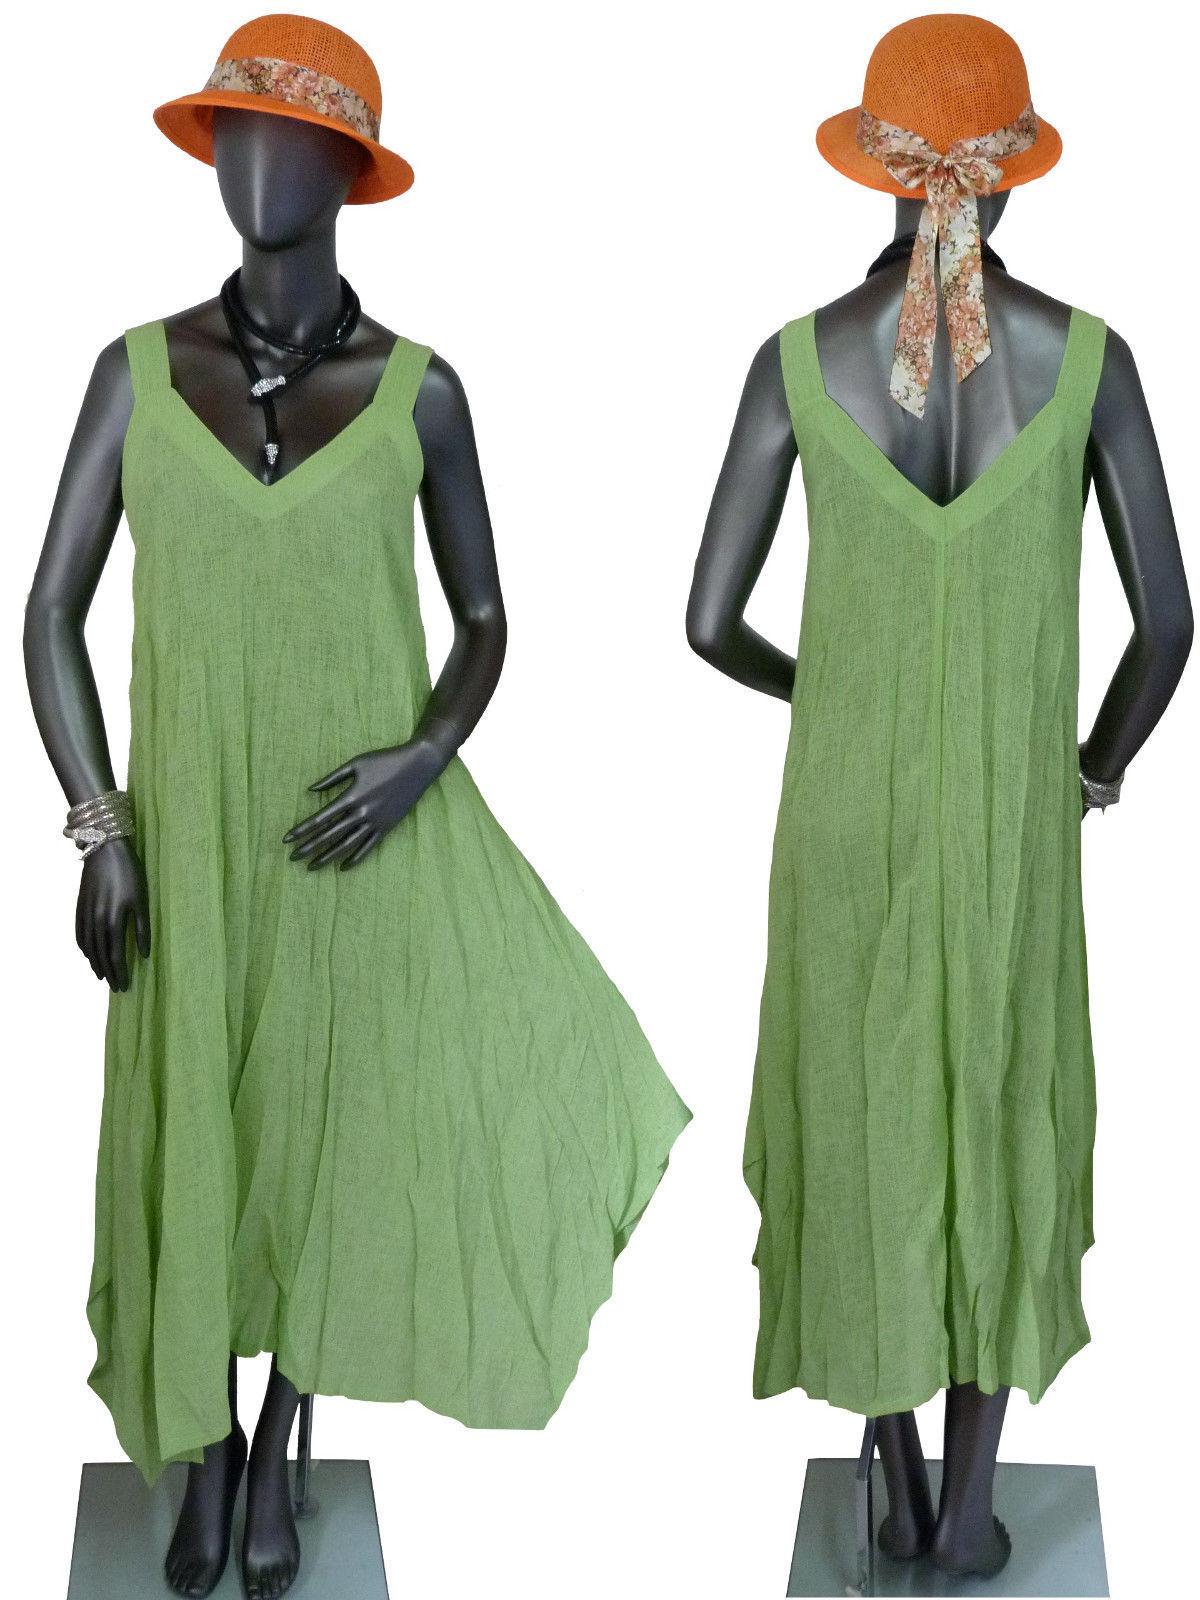 40 42 44  ESCALADYA Kleid Sommerkleid Strandkleid Trägerkleid leicht lang Kiwi